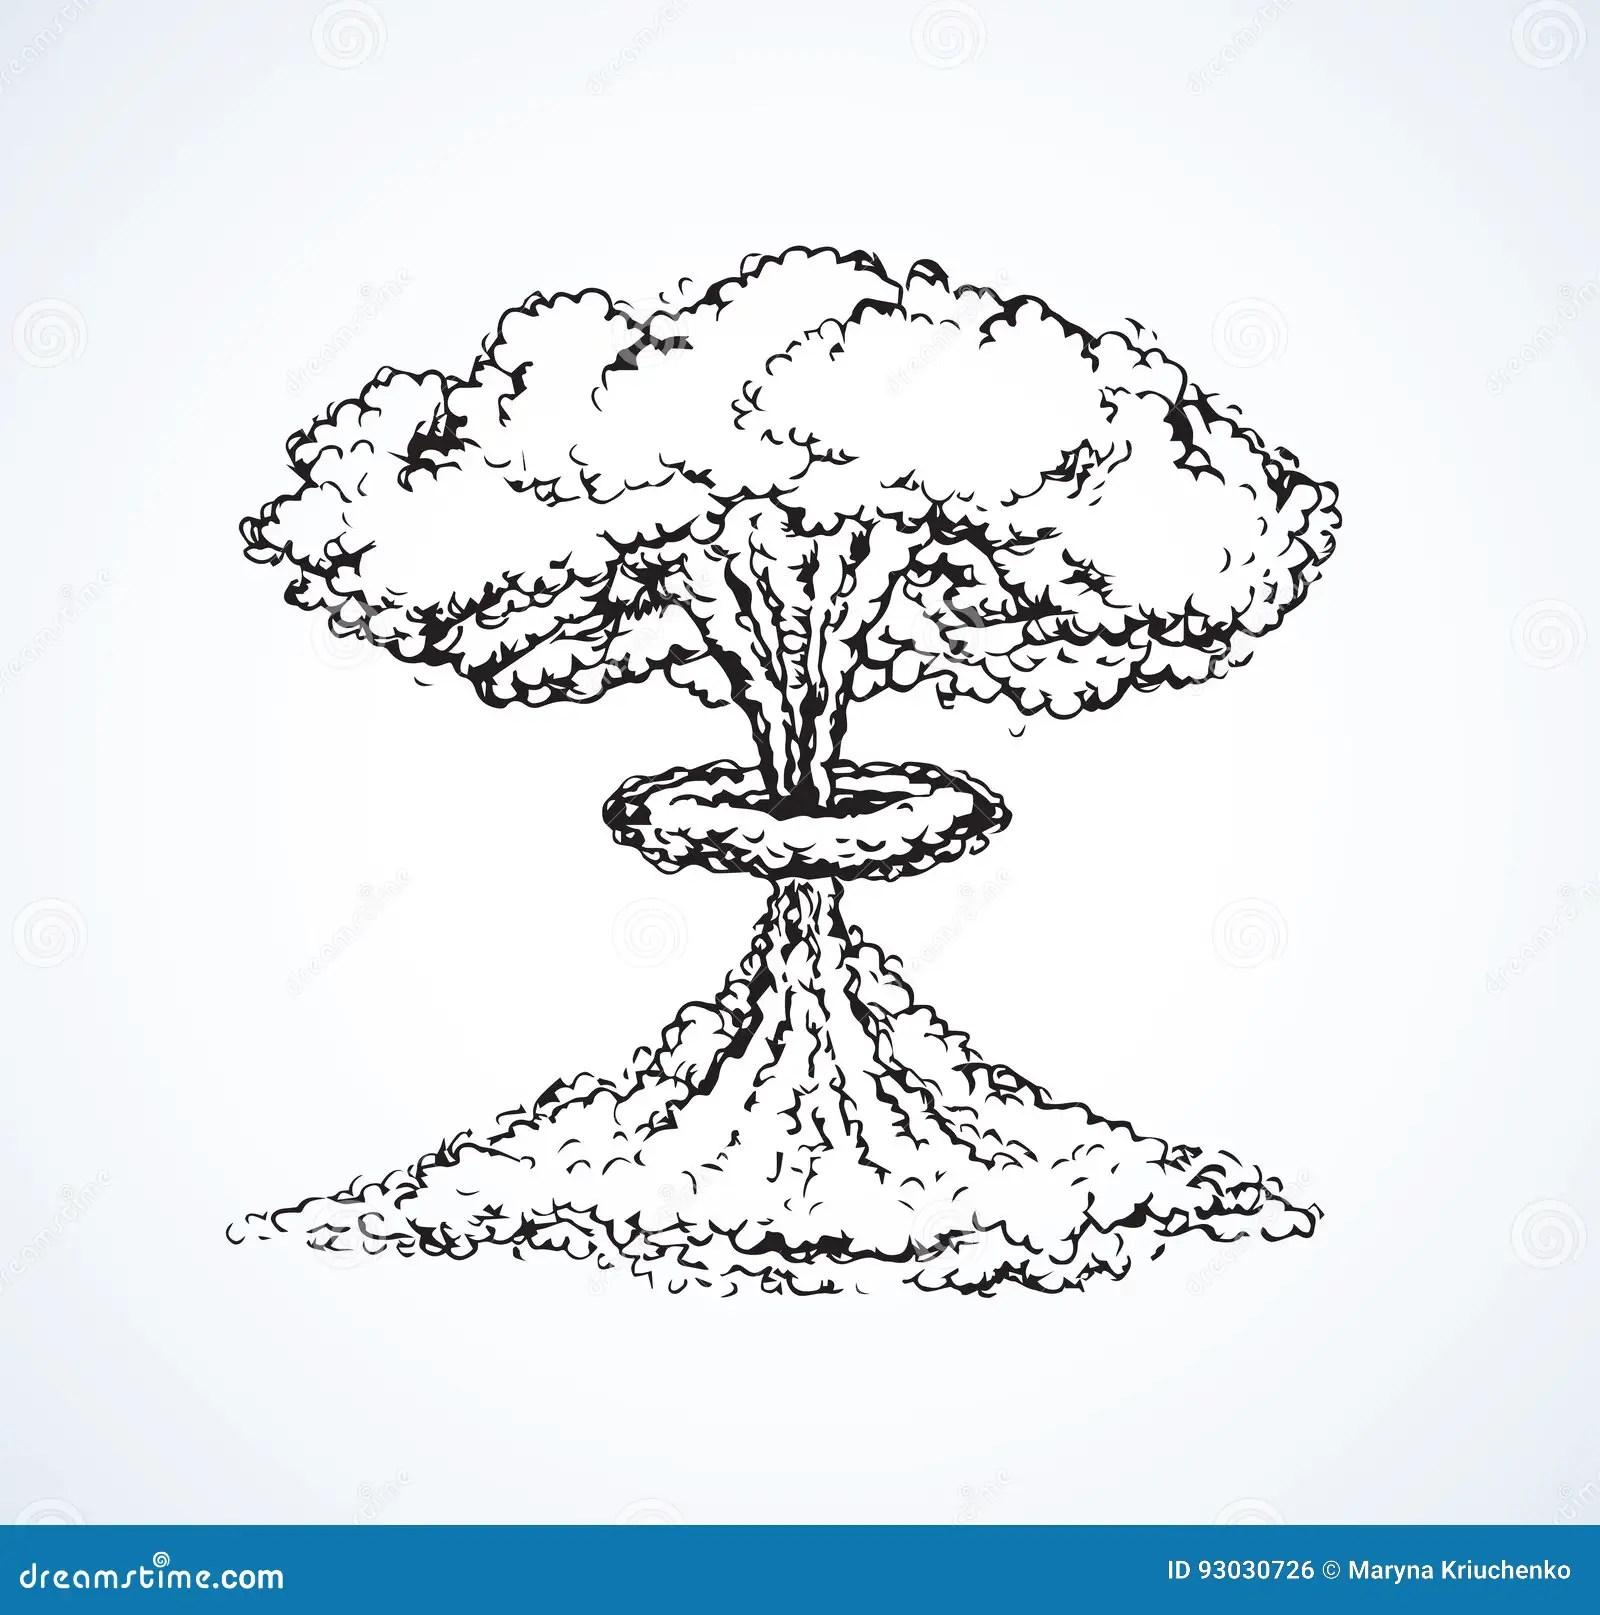 Nuclear Mushroom Cloud Sketch Vector Illustration